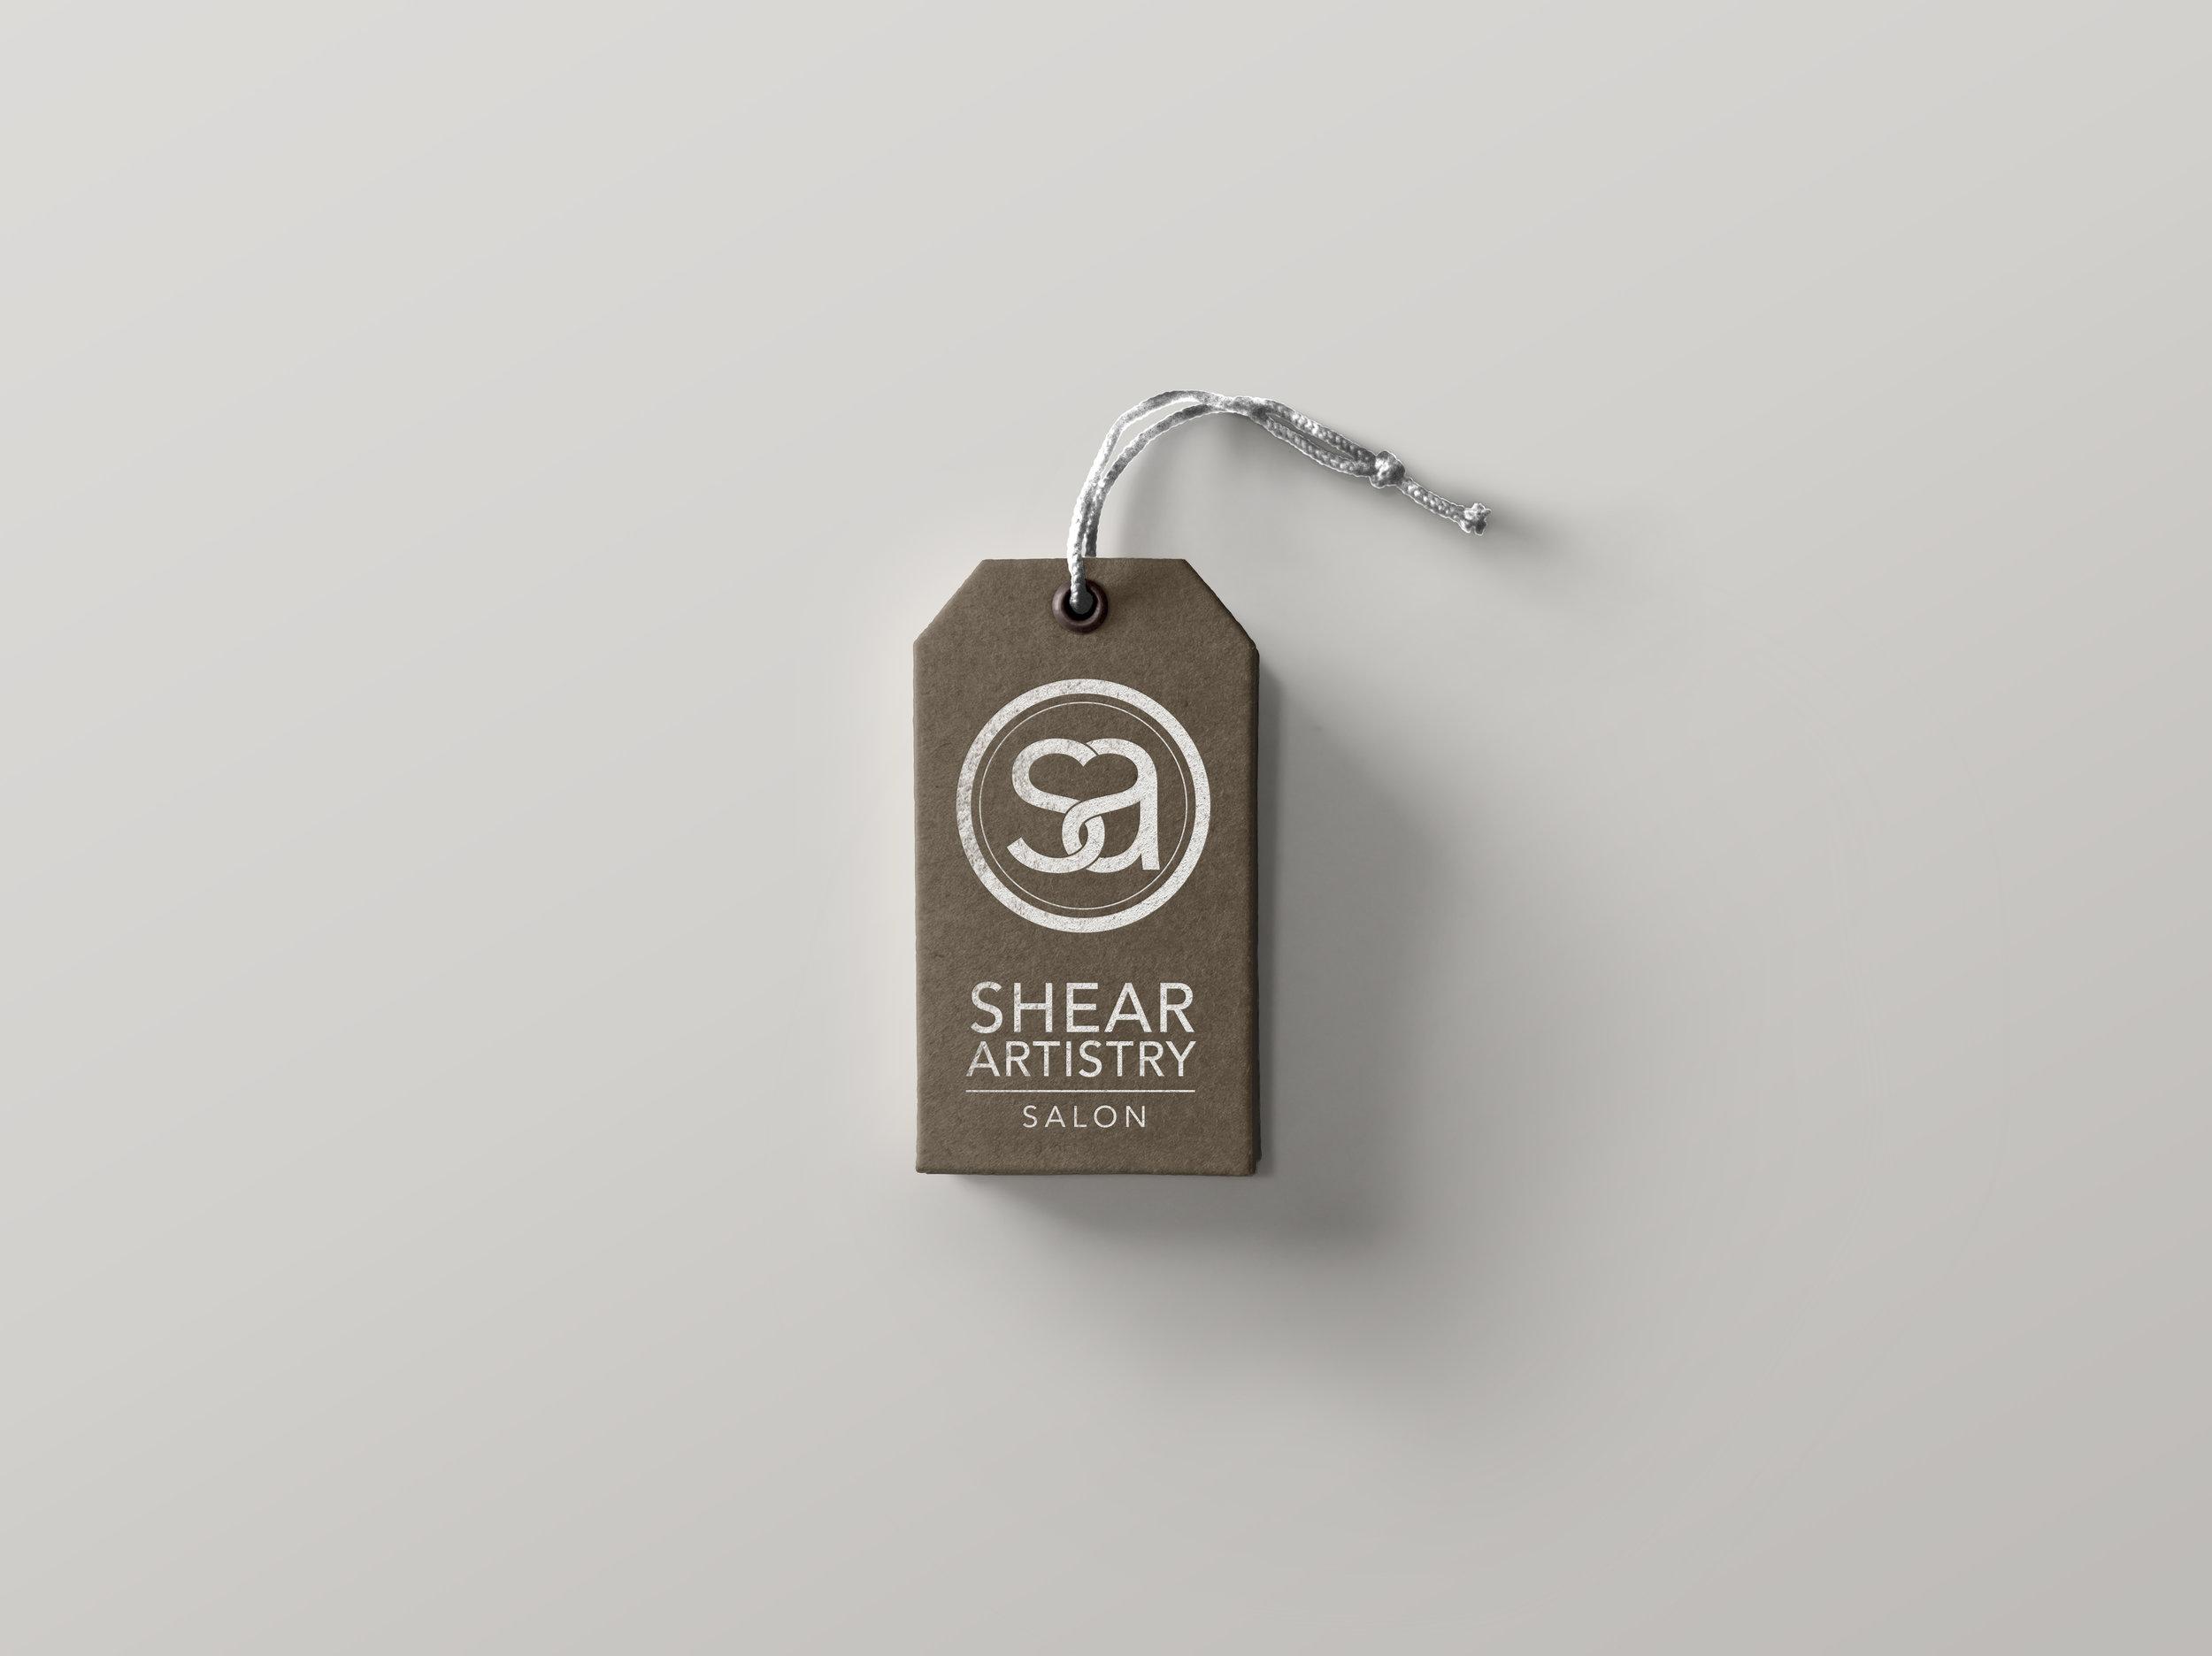 shear-artistry_label.jpg